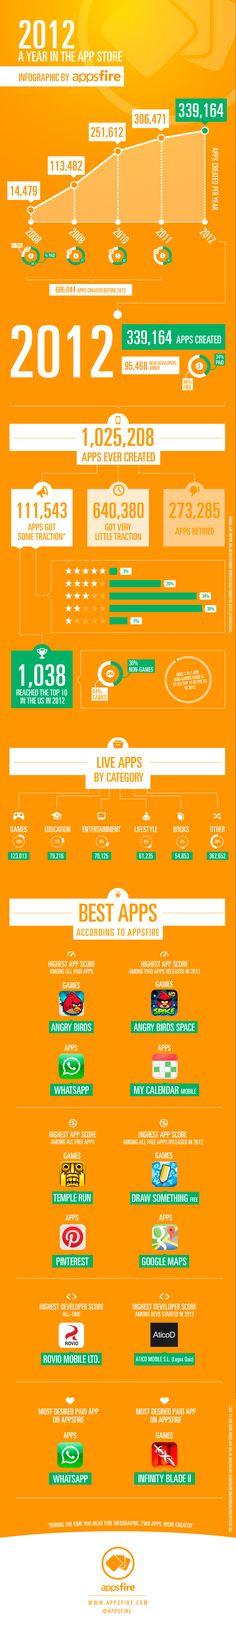 2012 in App Store